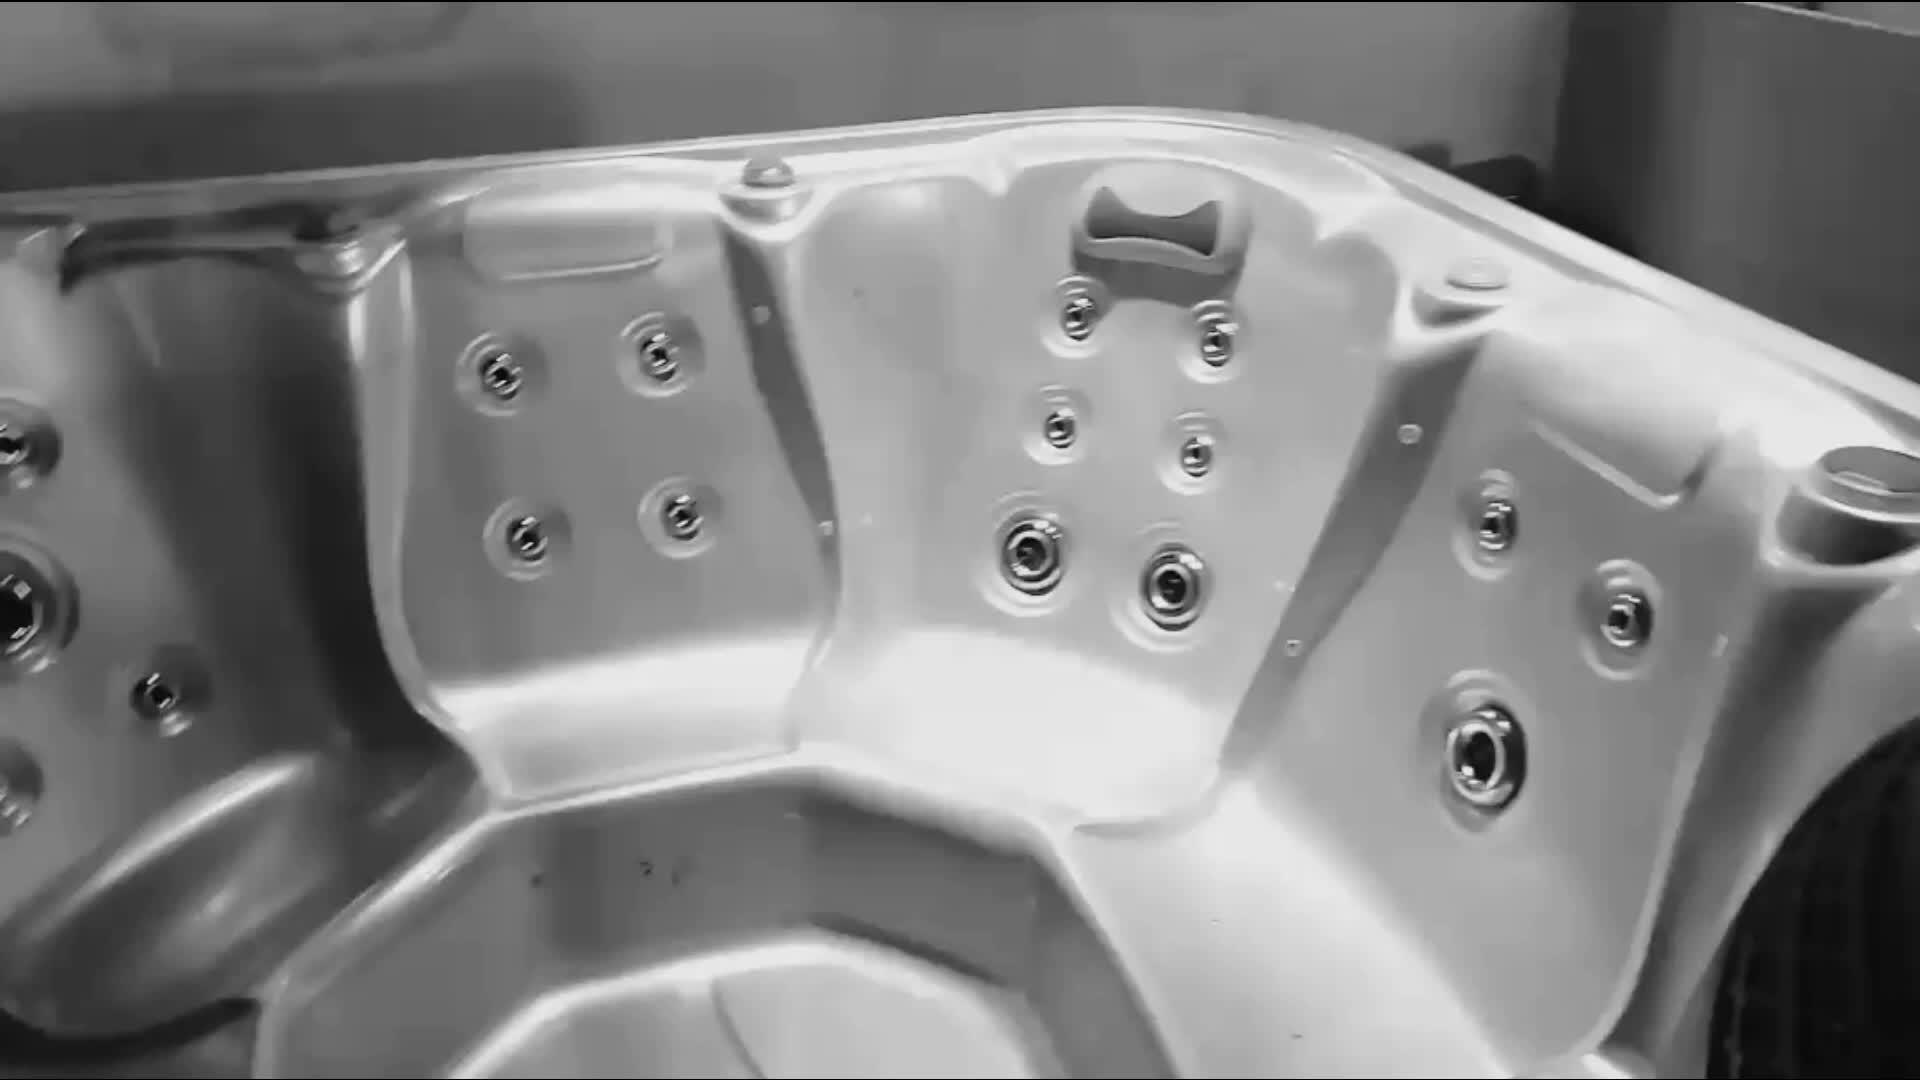 Sunrans Harga Pabrik 5 Orang Menggunakan Kolam Pijat Hot Tub